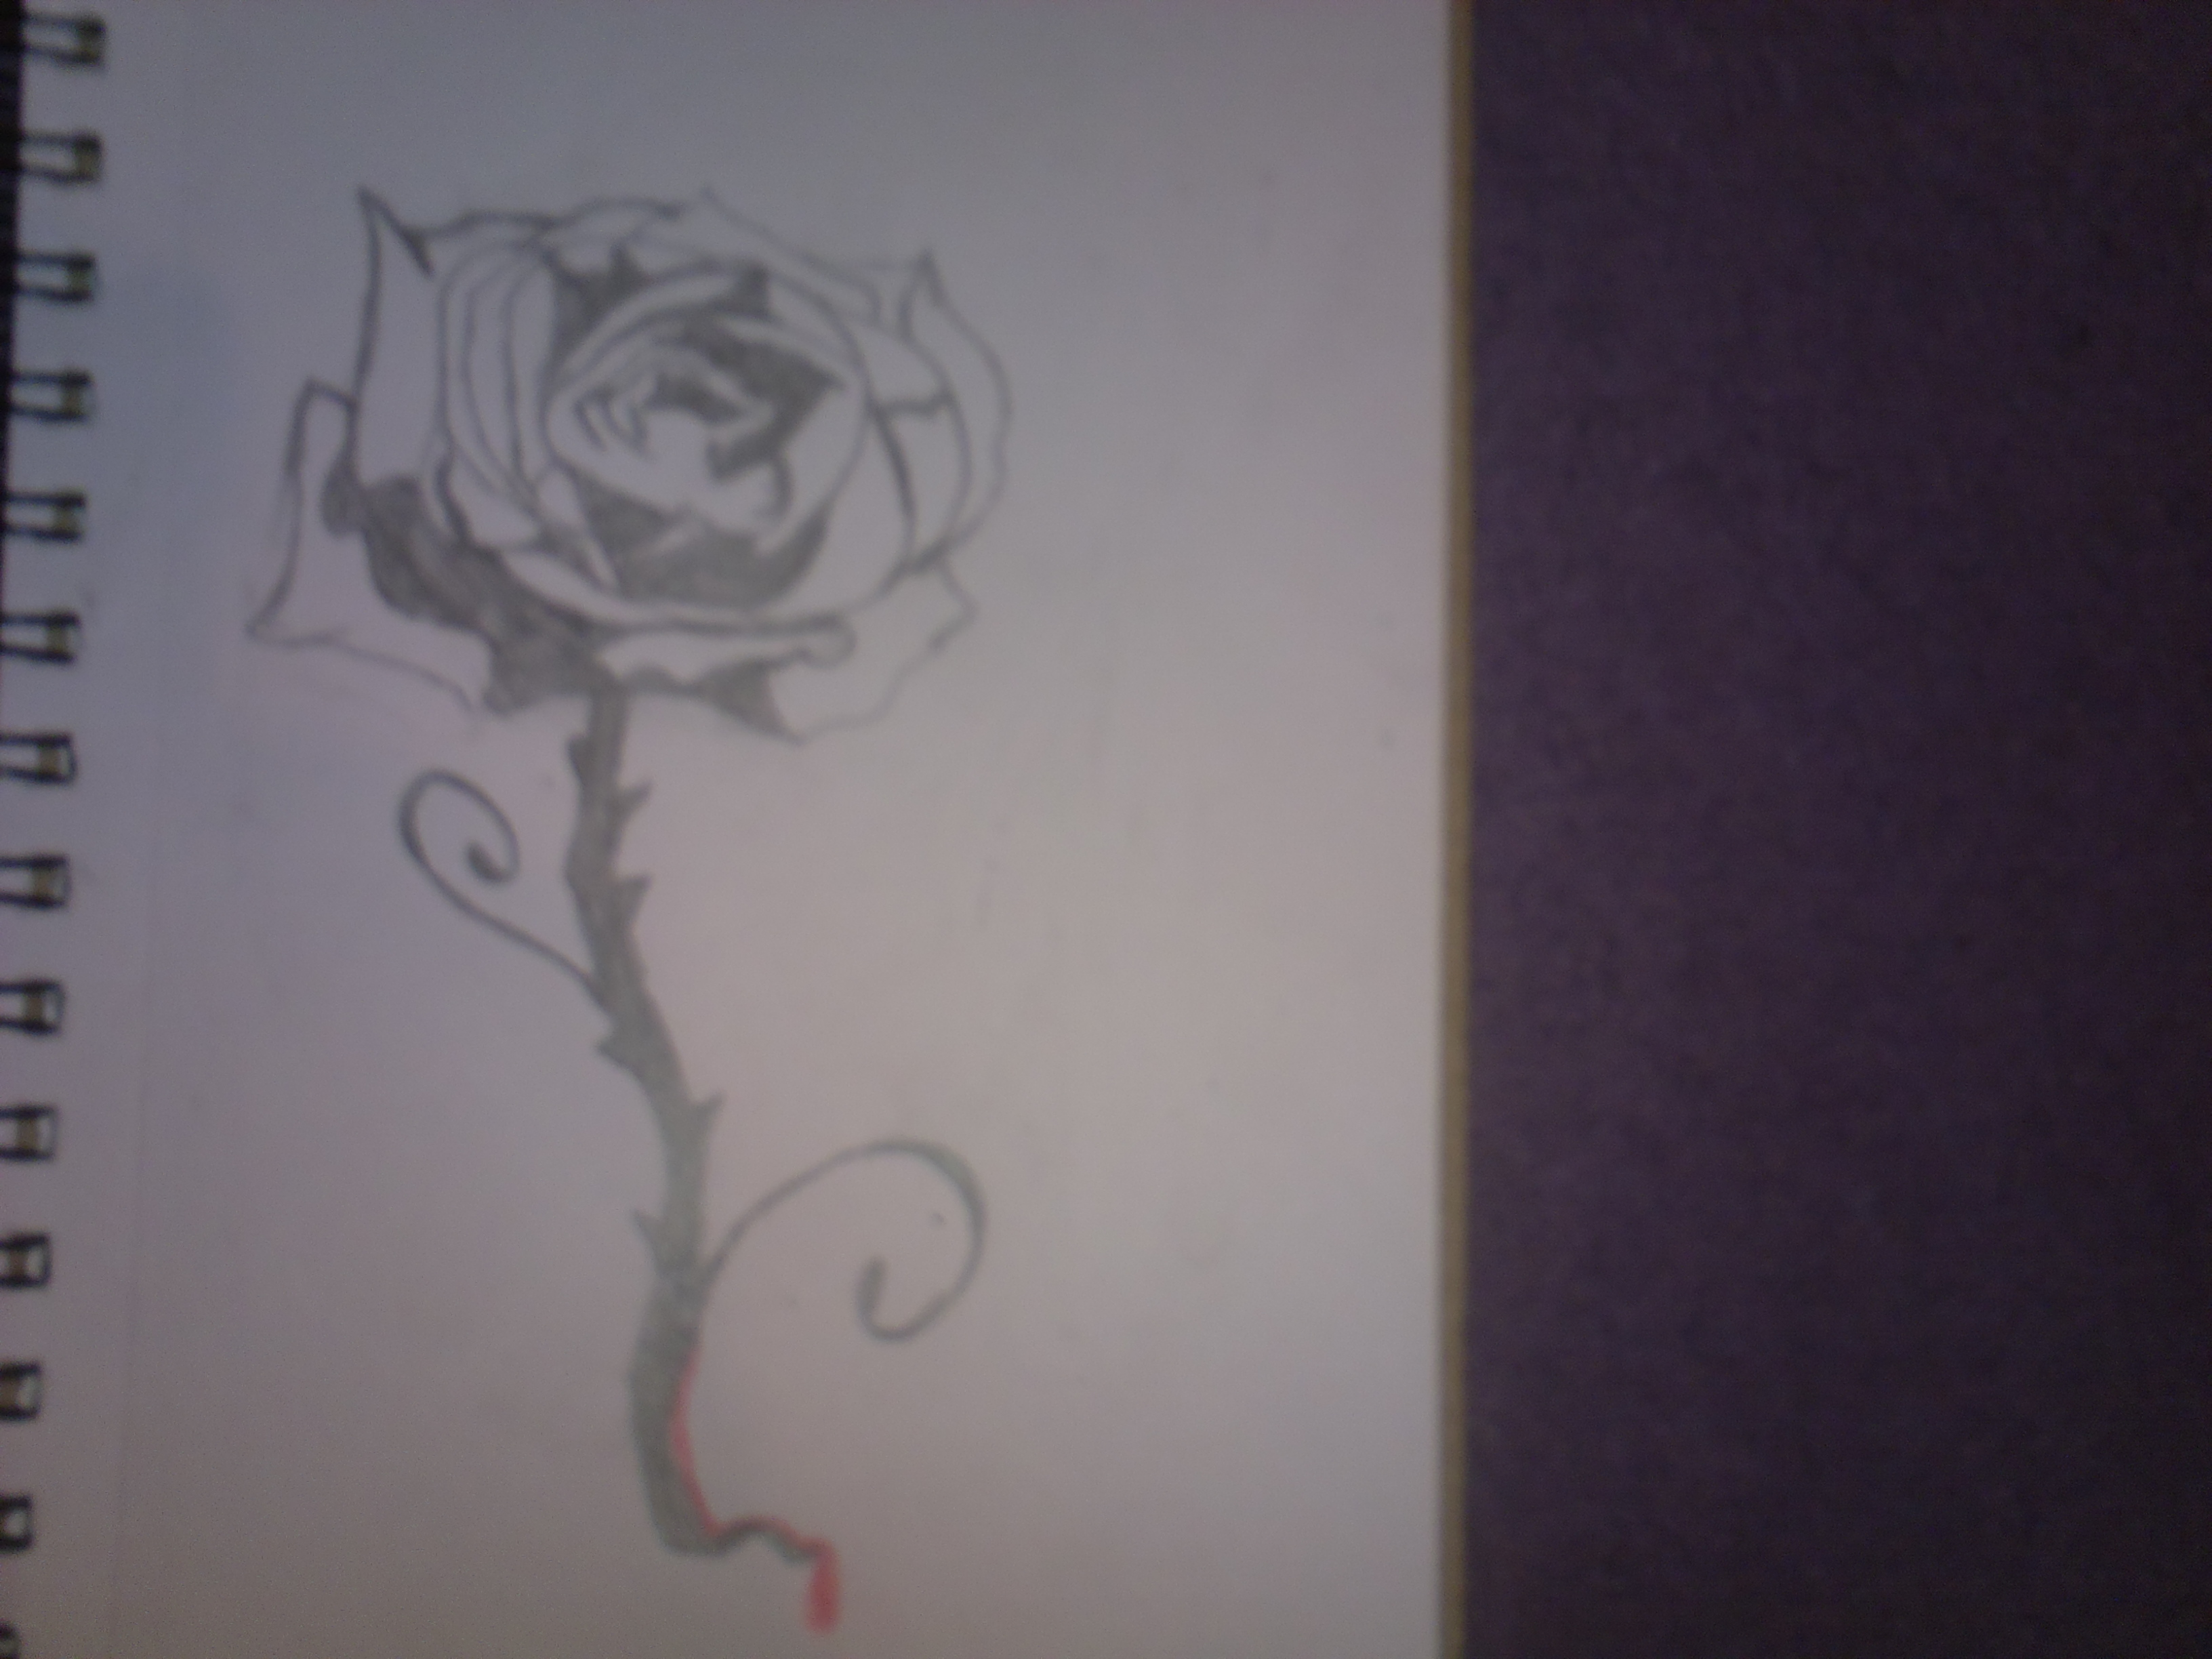 gothic blood rose tattoo design by larathekitsunecub on deviantart. Black Bedroom Furniture Sets. Home Design Ideas